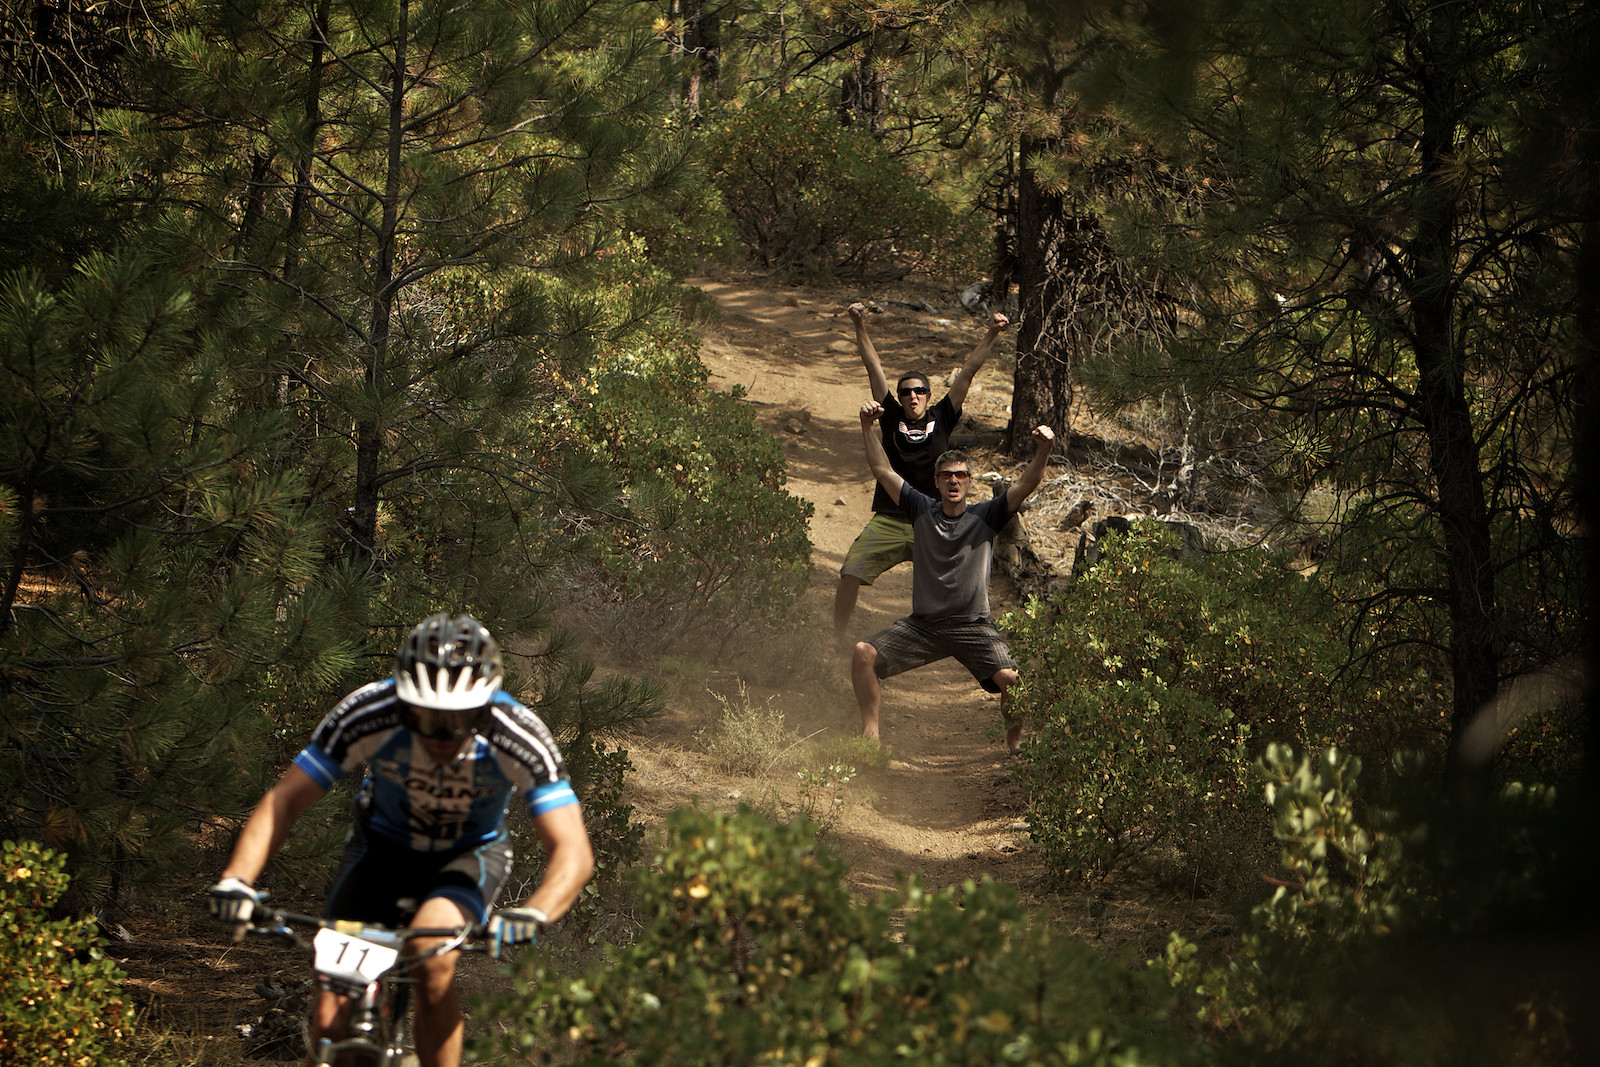 2012 Sisters Enduro Photobomb. - corytepper.com - Mountain Biking Pictures - Vital MTB